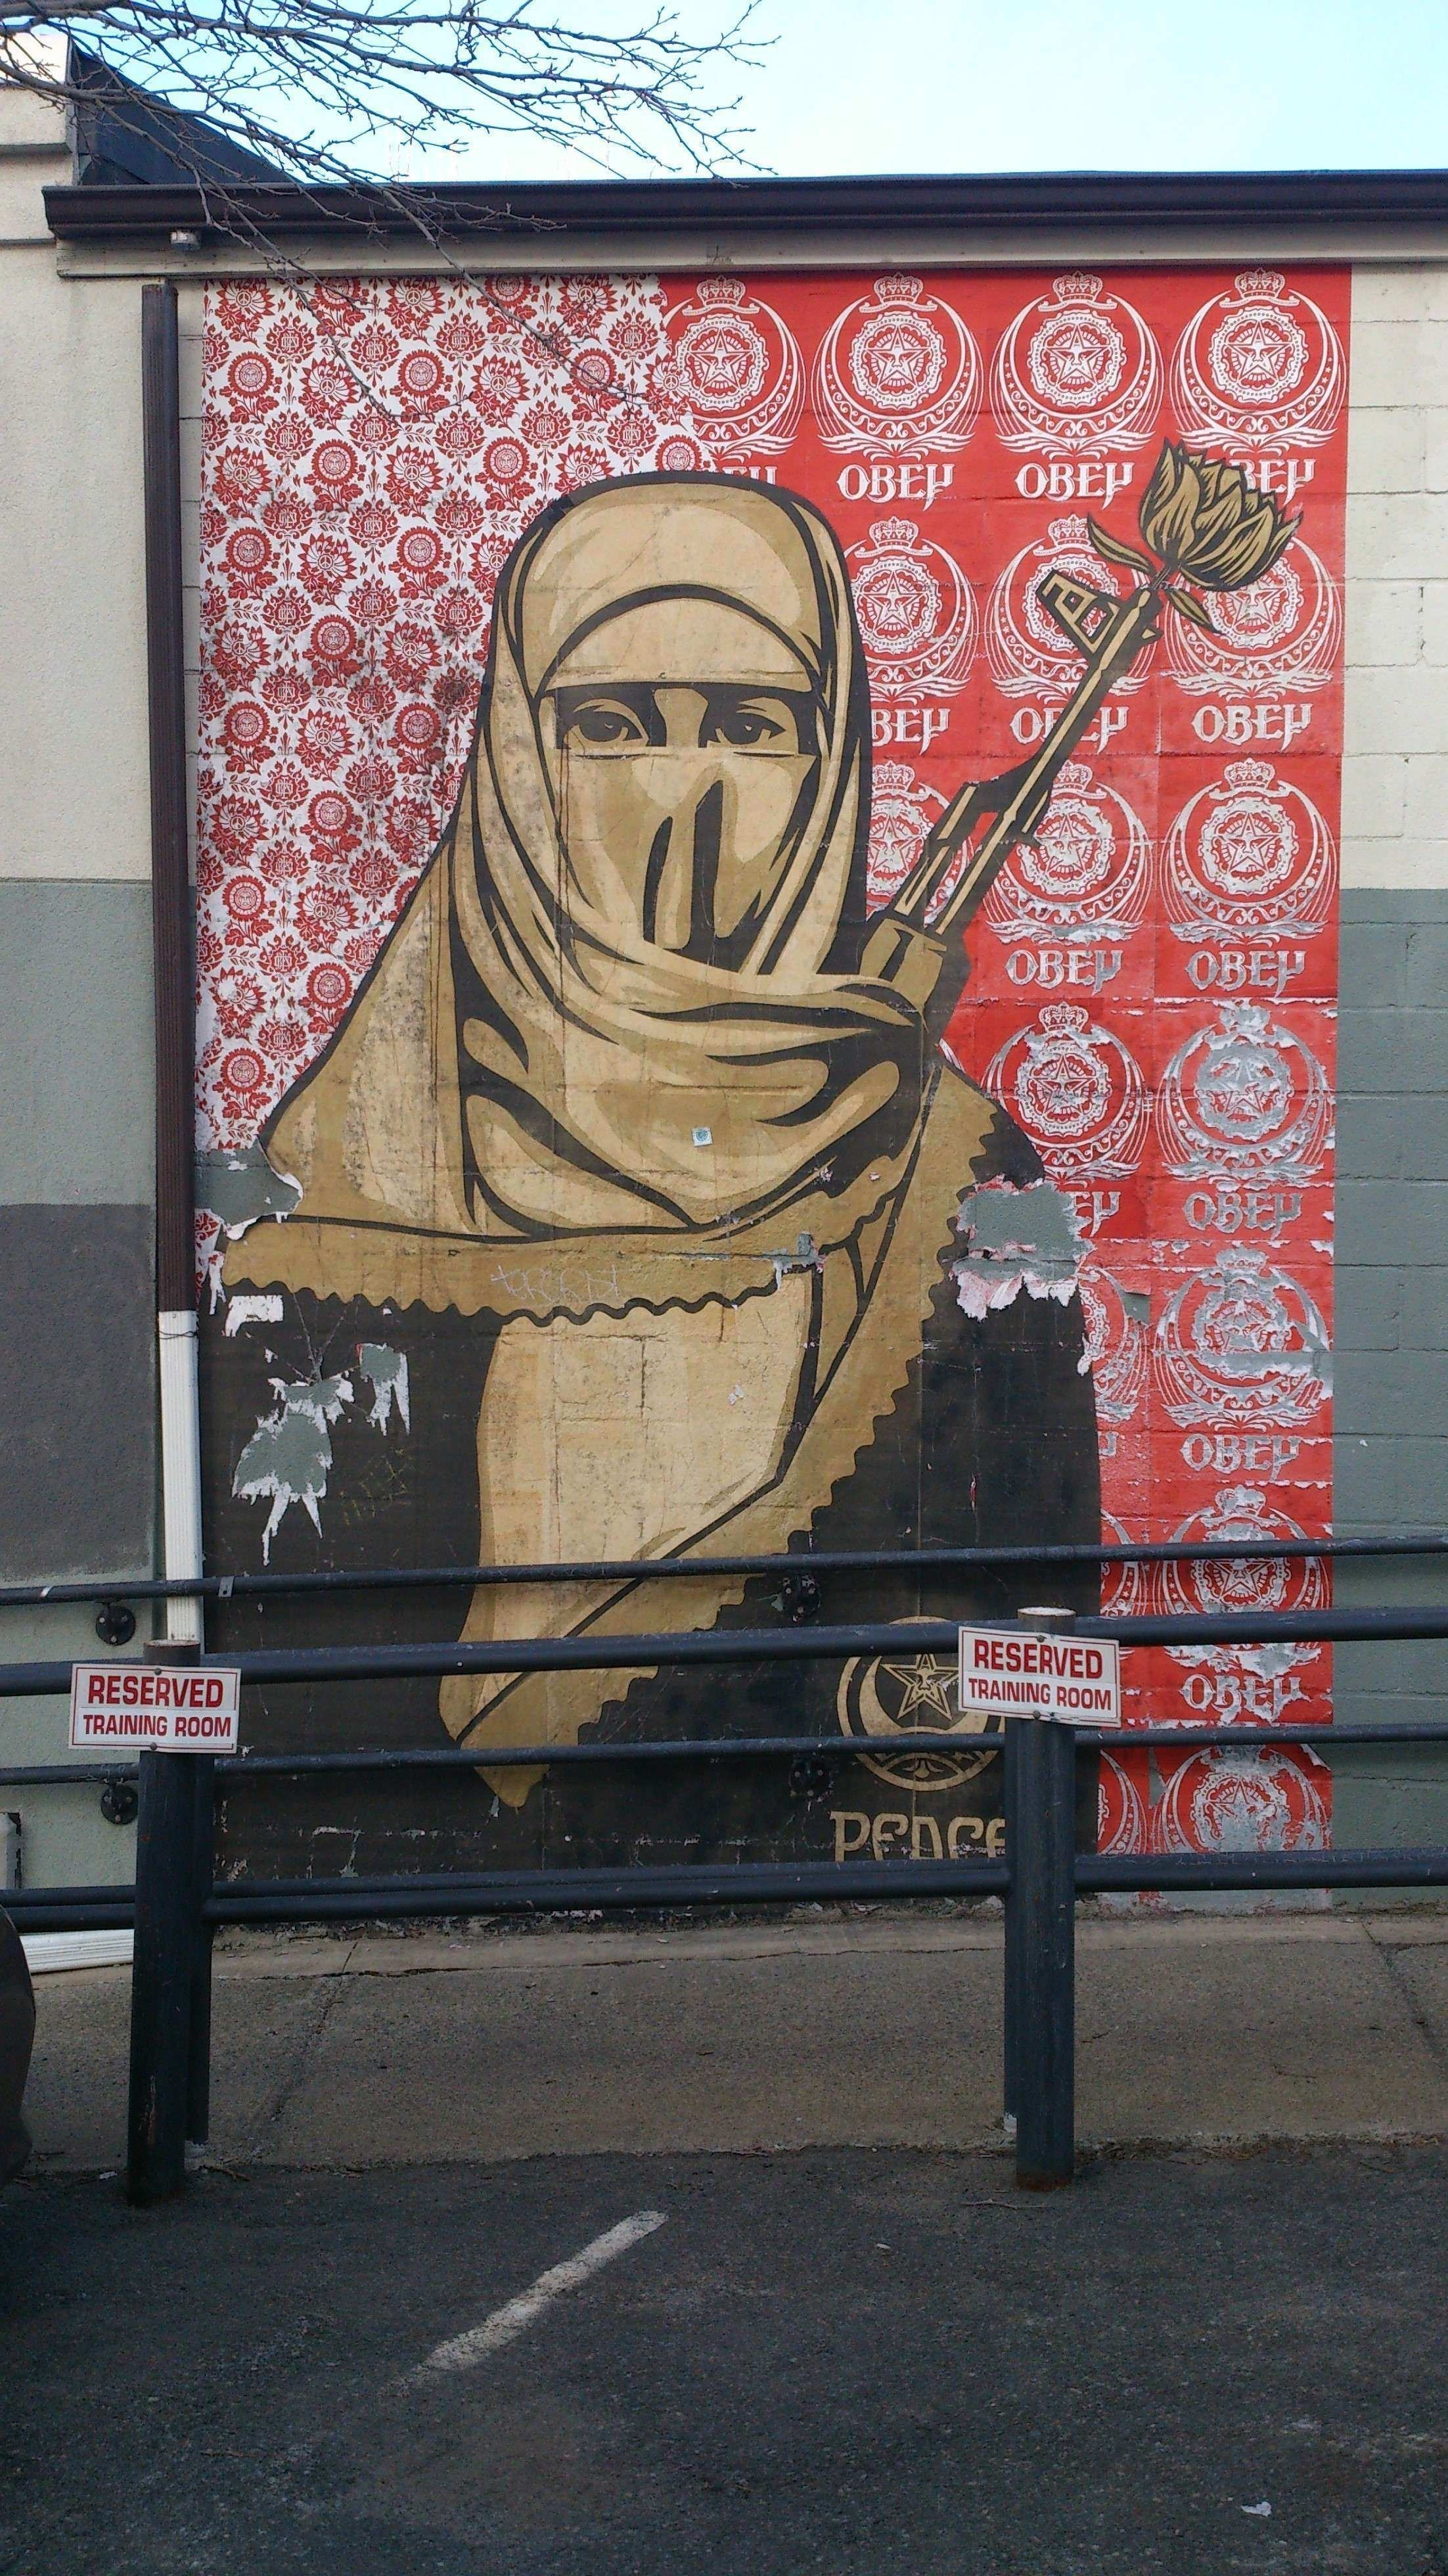 Boston Wall Art Lovely Street Art Wall Art – Boston Area | Wall Art In Latest Boston Wall Art (View 10 of 20)